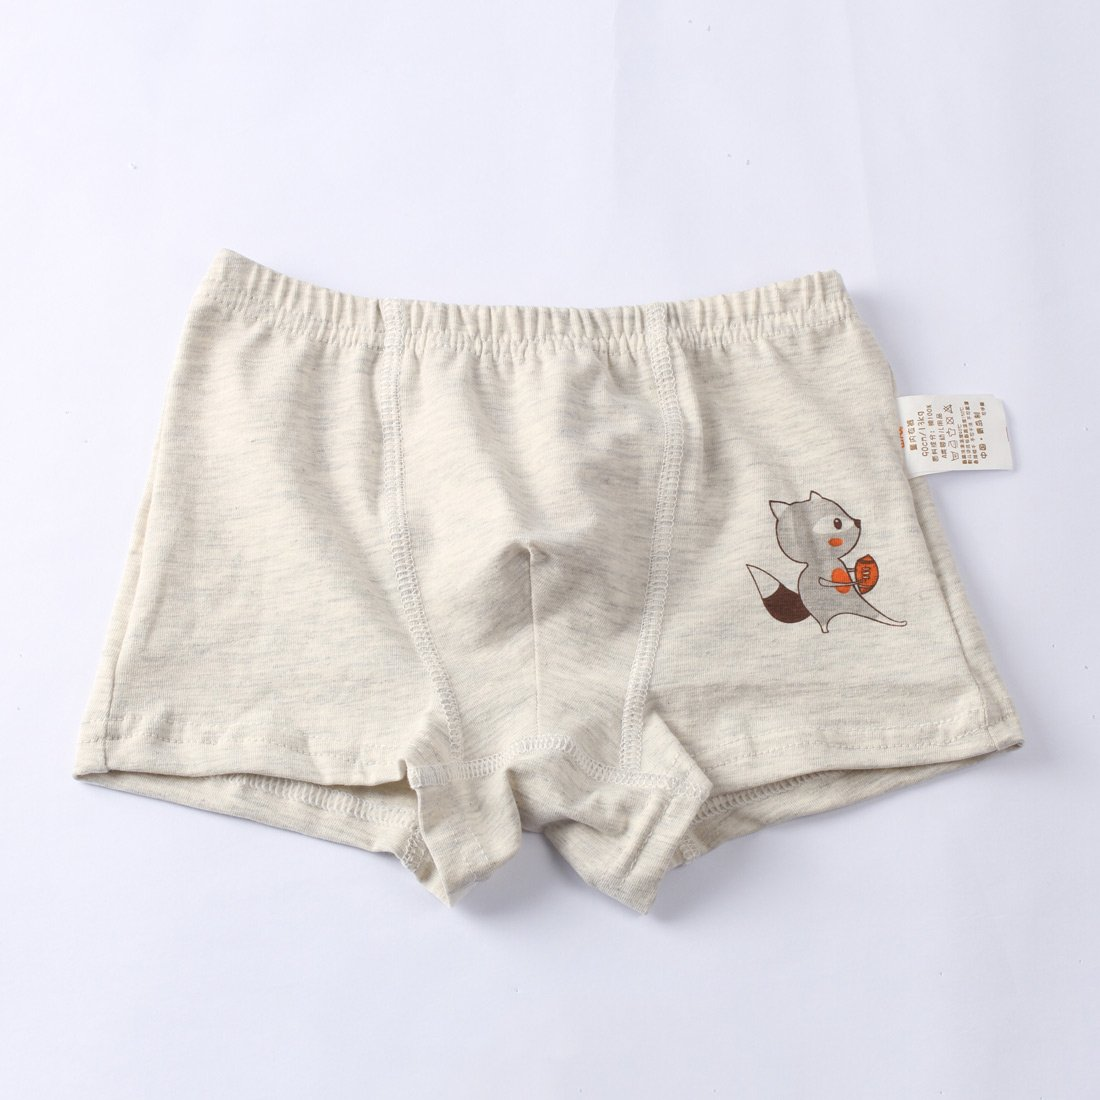 Joyo roy Unisex Baby Potty Training Undies Cotton Diaper Short Pants Pack of 3